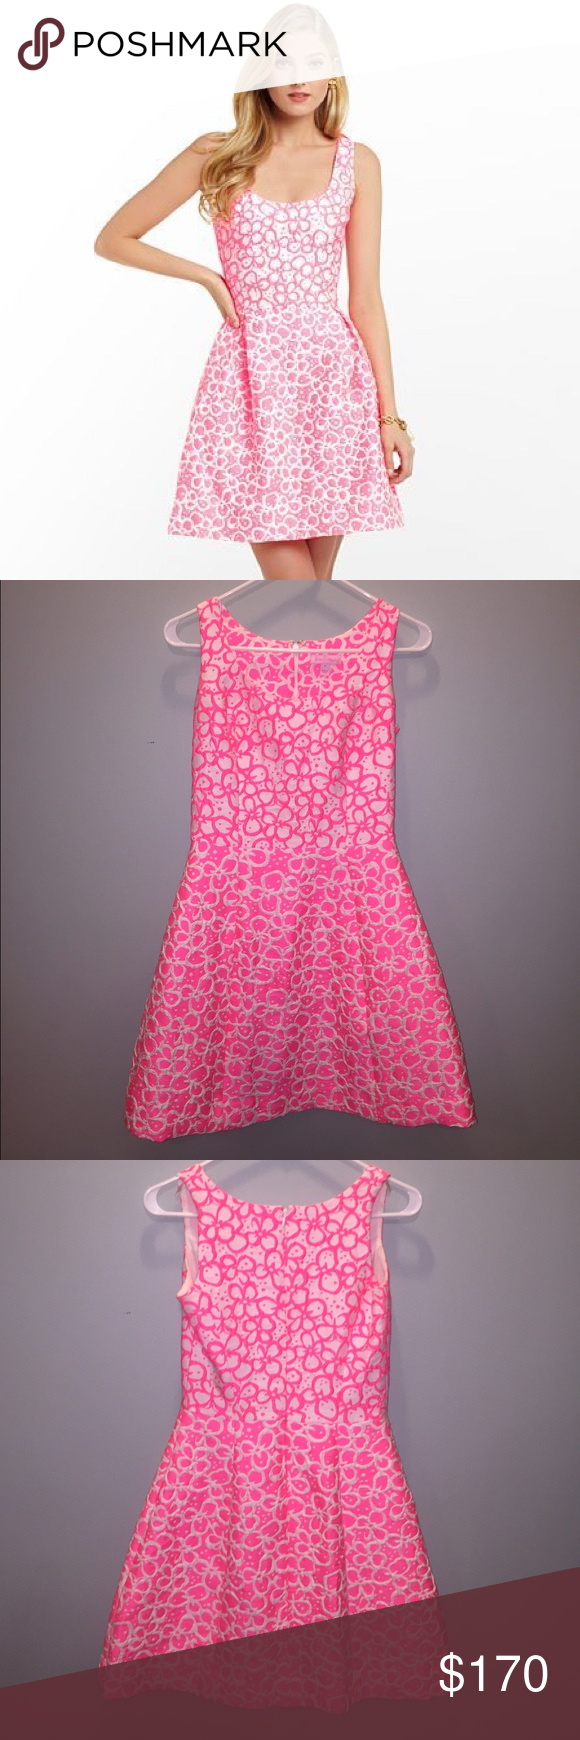 Lilly Pulitzer Joslin Dress in Fiesta Pink